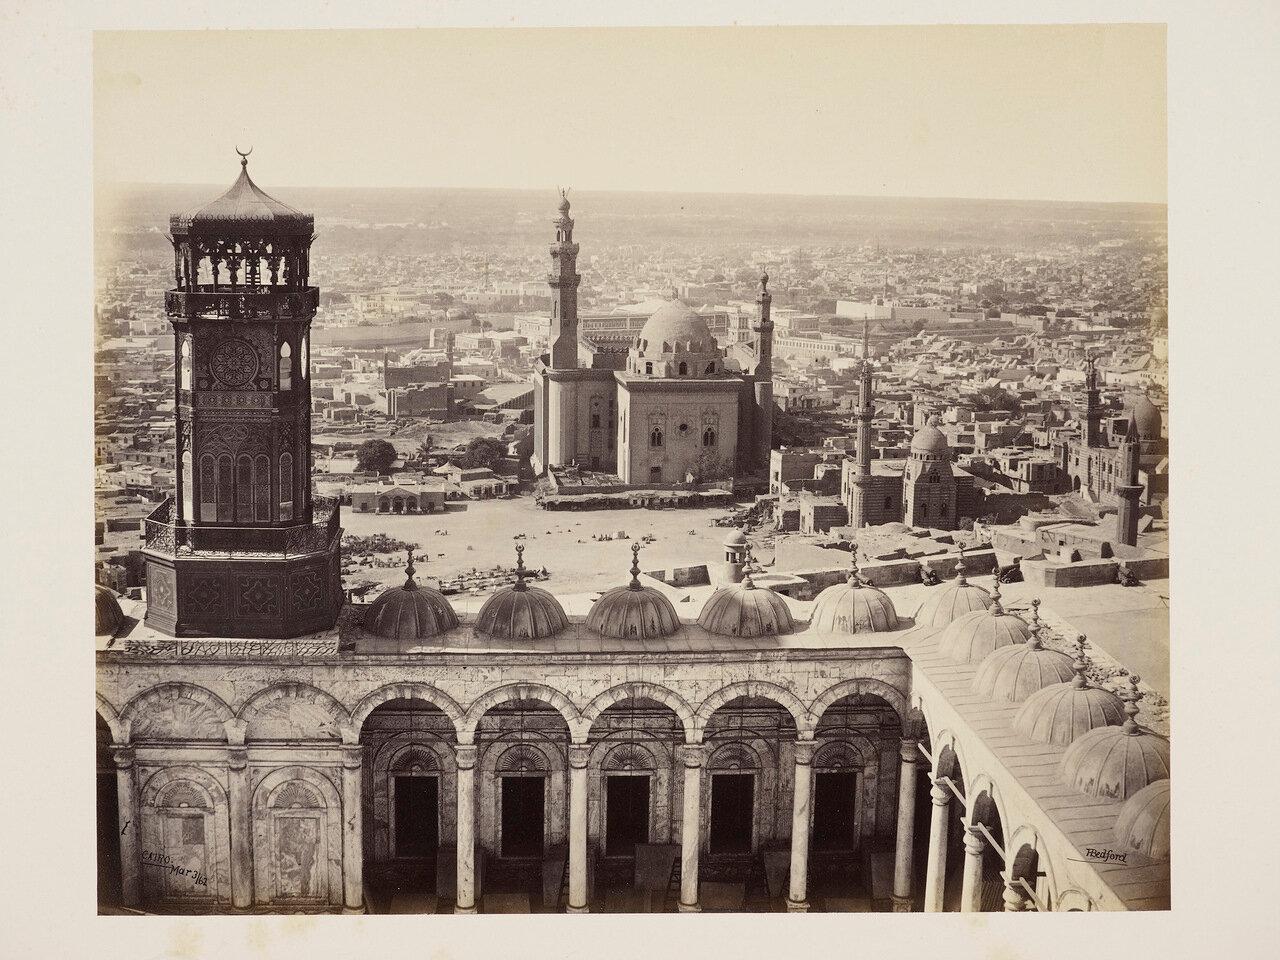 3 марта 1862. Вид с мечетью Мухаммеда-Али. Каир